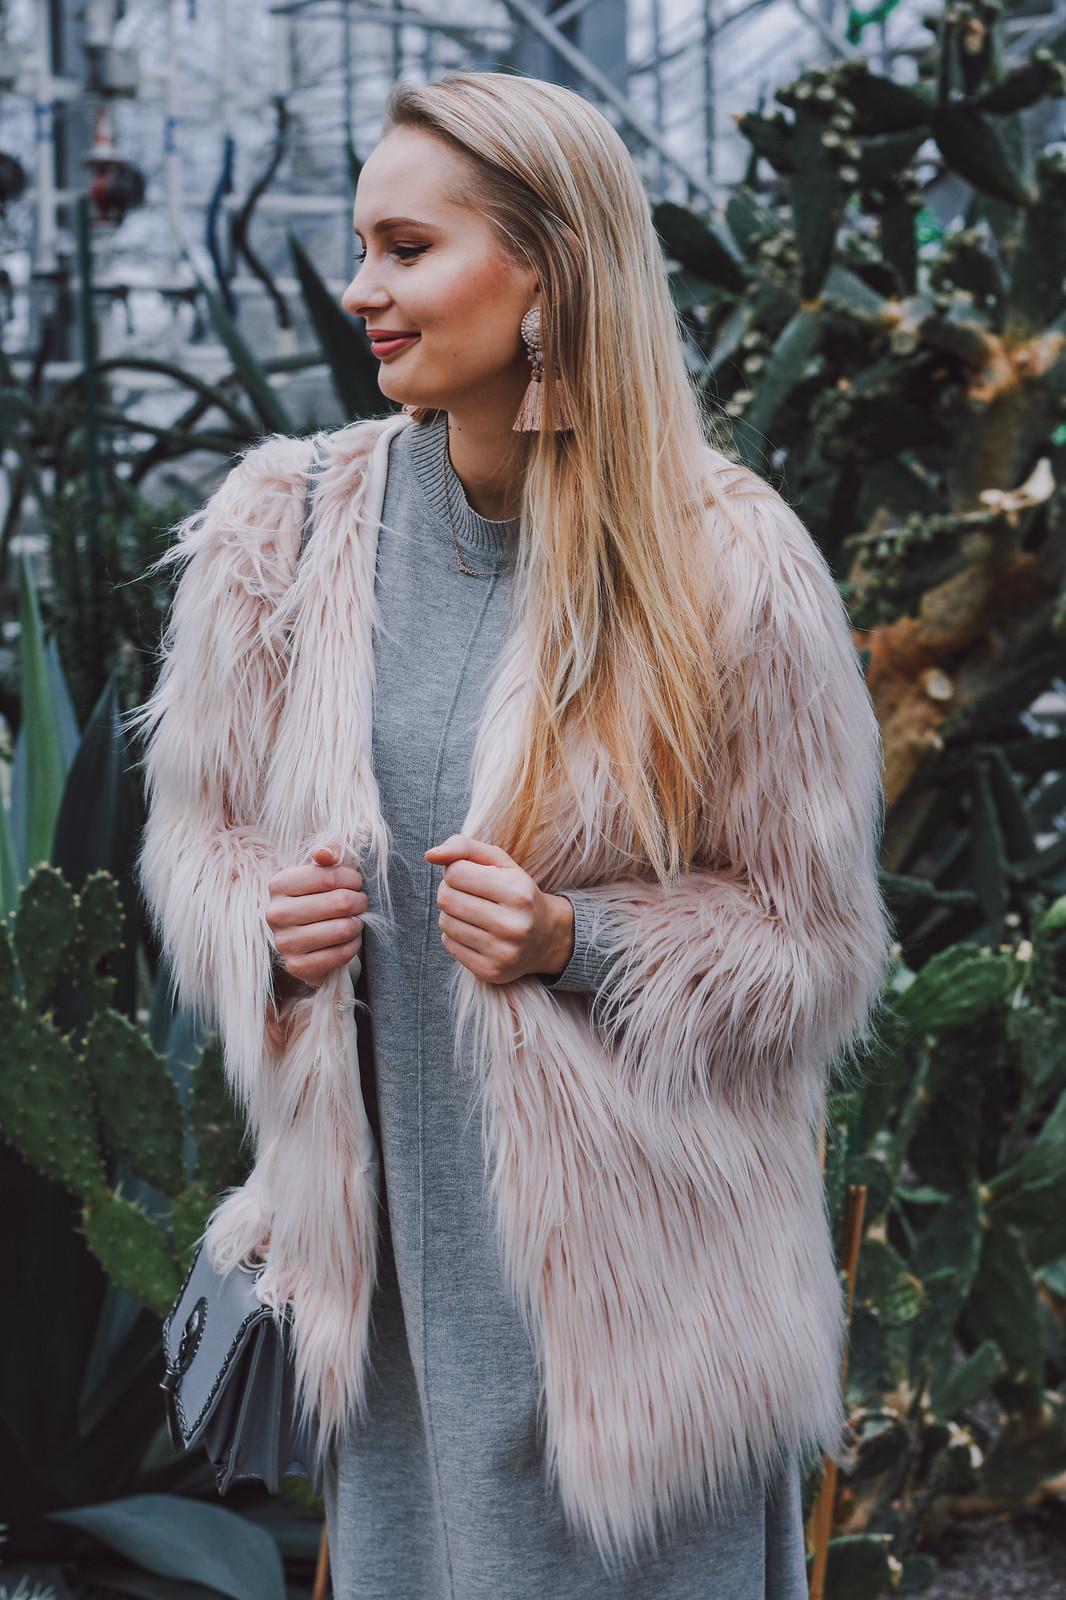 Incorporating pink in winter wardrobe